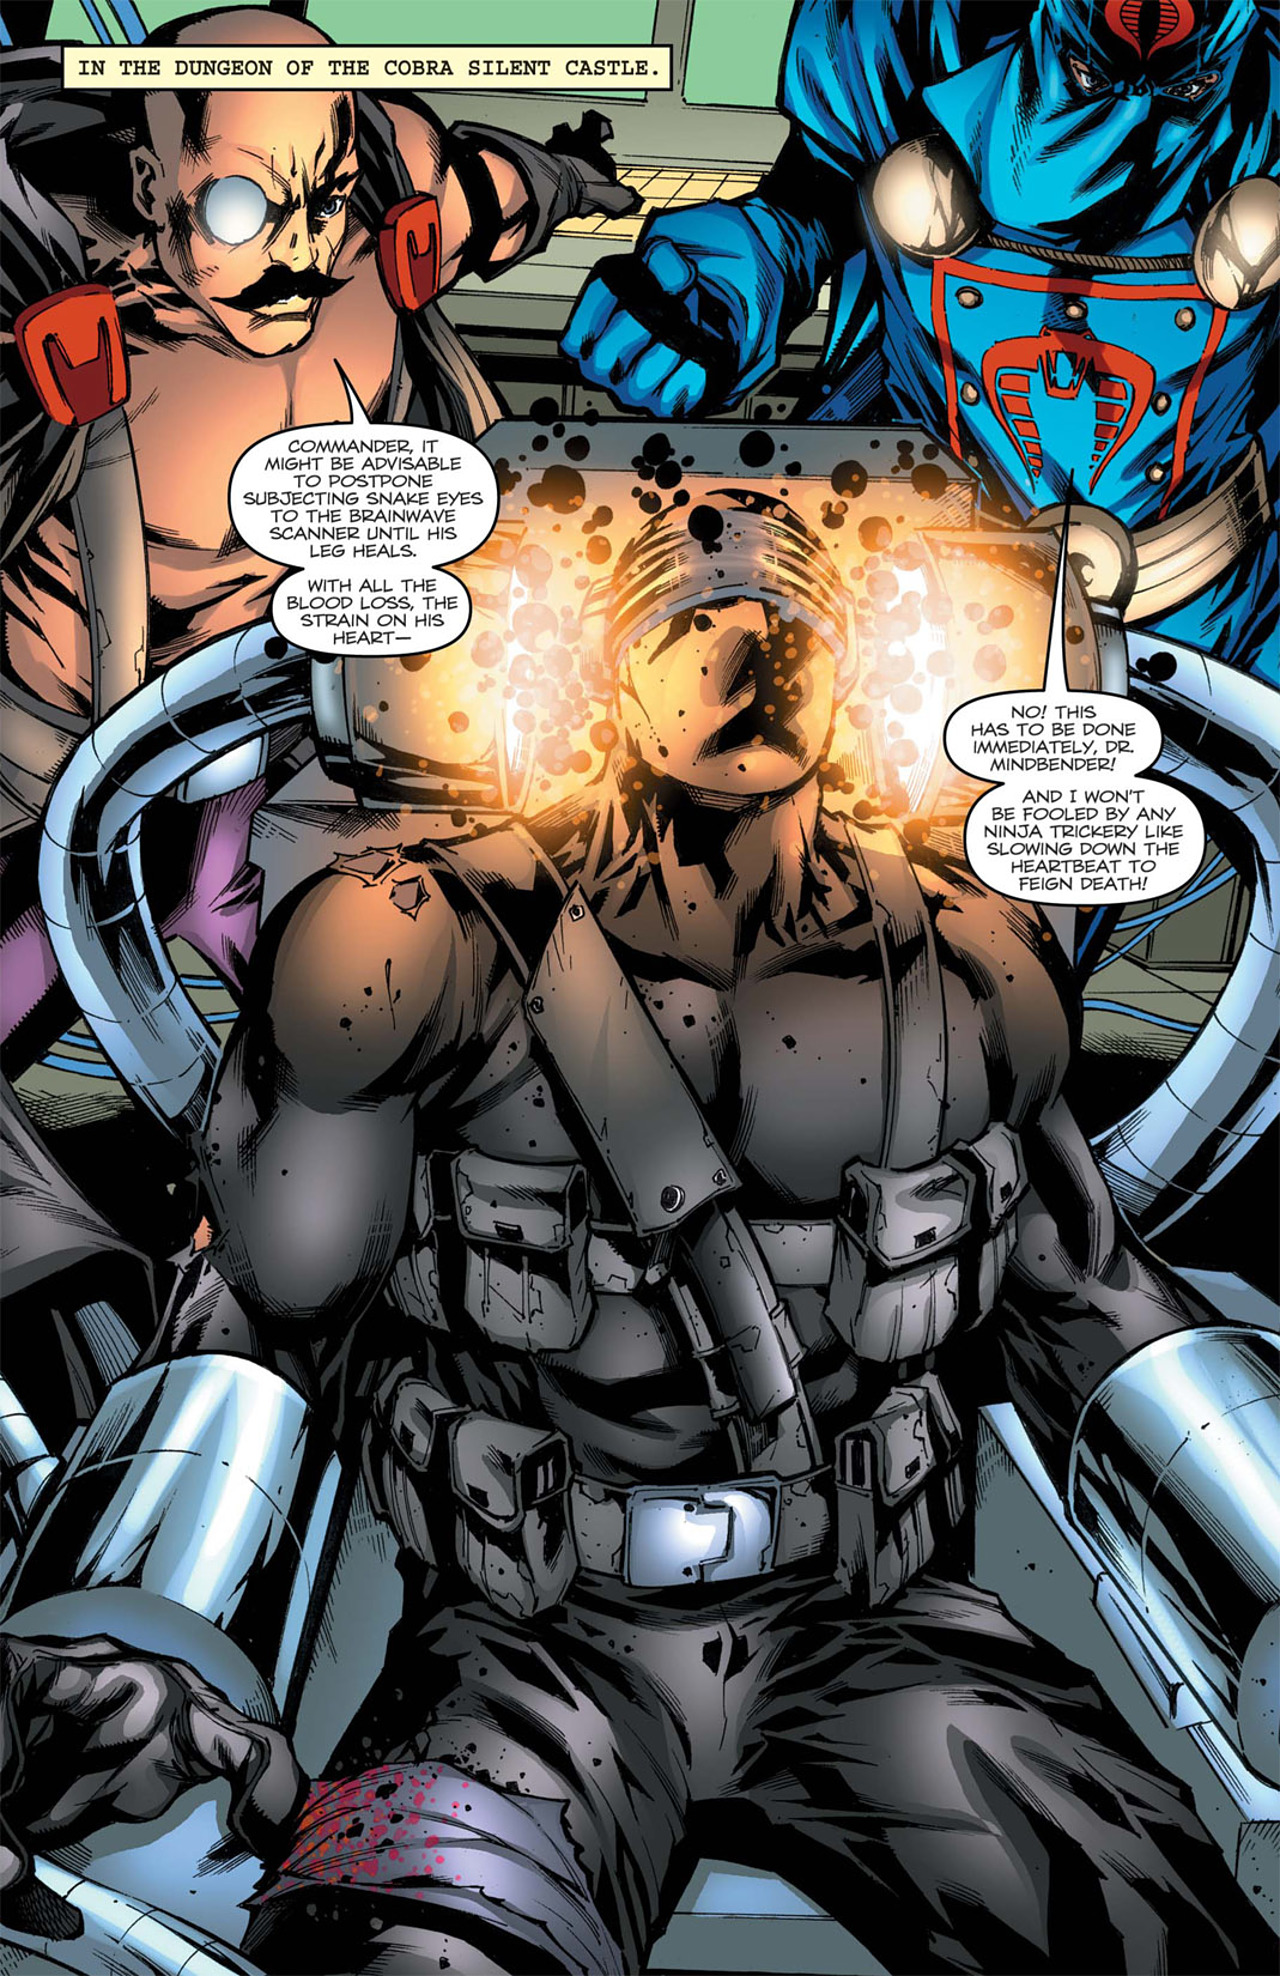 G.I. Joe: A Real American Hero 160 Page 4